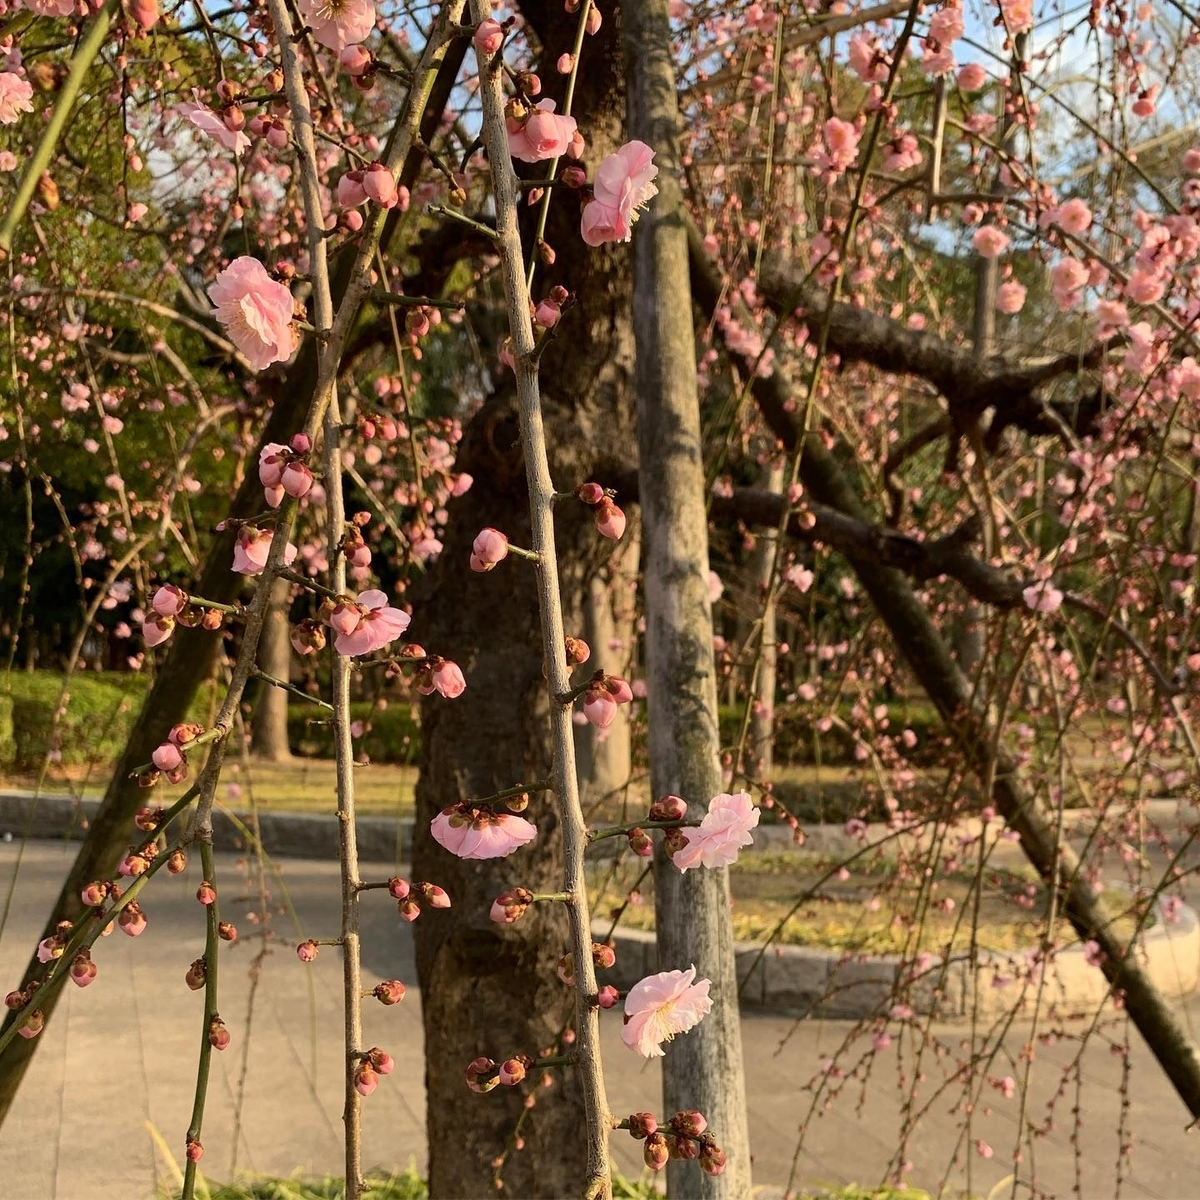 大阪城公園内の梅